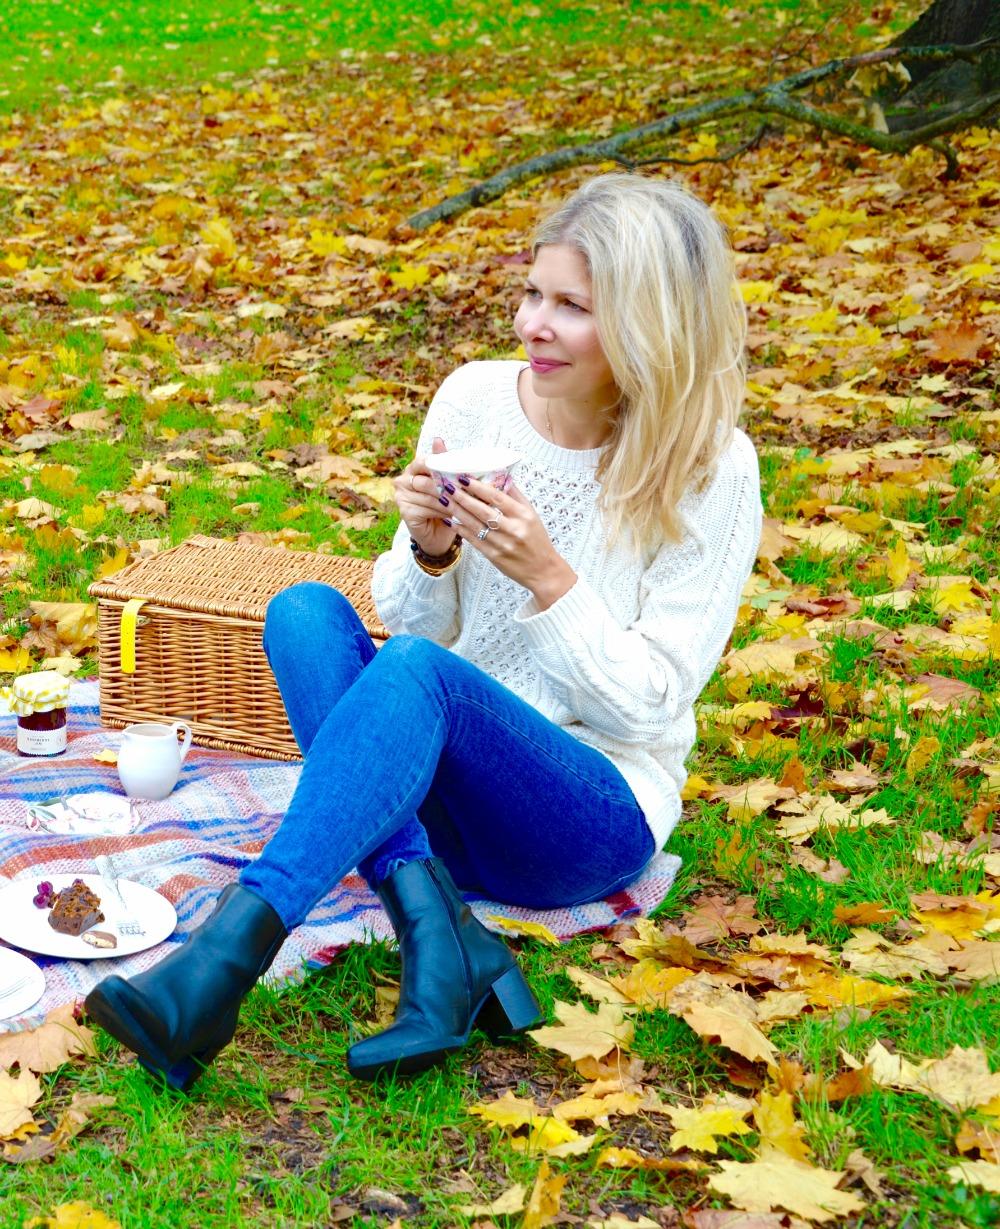 Selfridges Christmas hampers gift box - Autumn Picnics